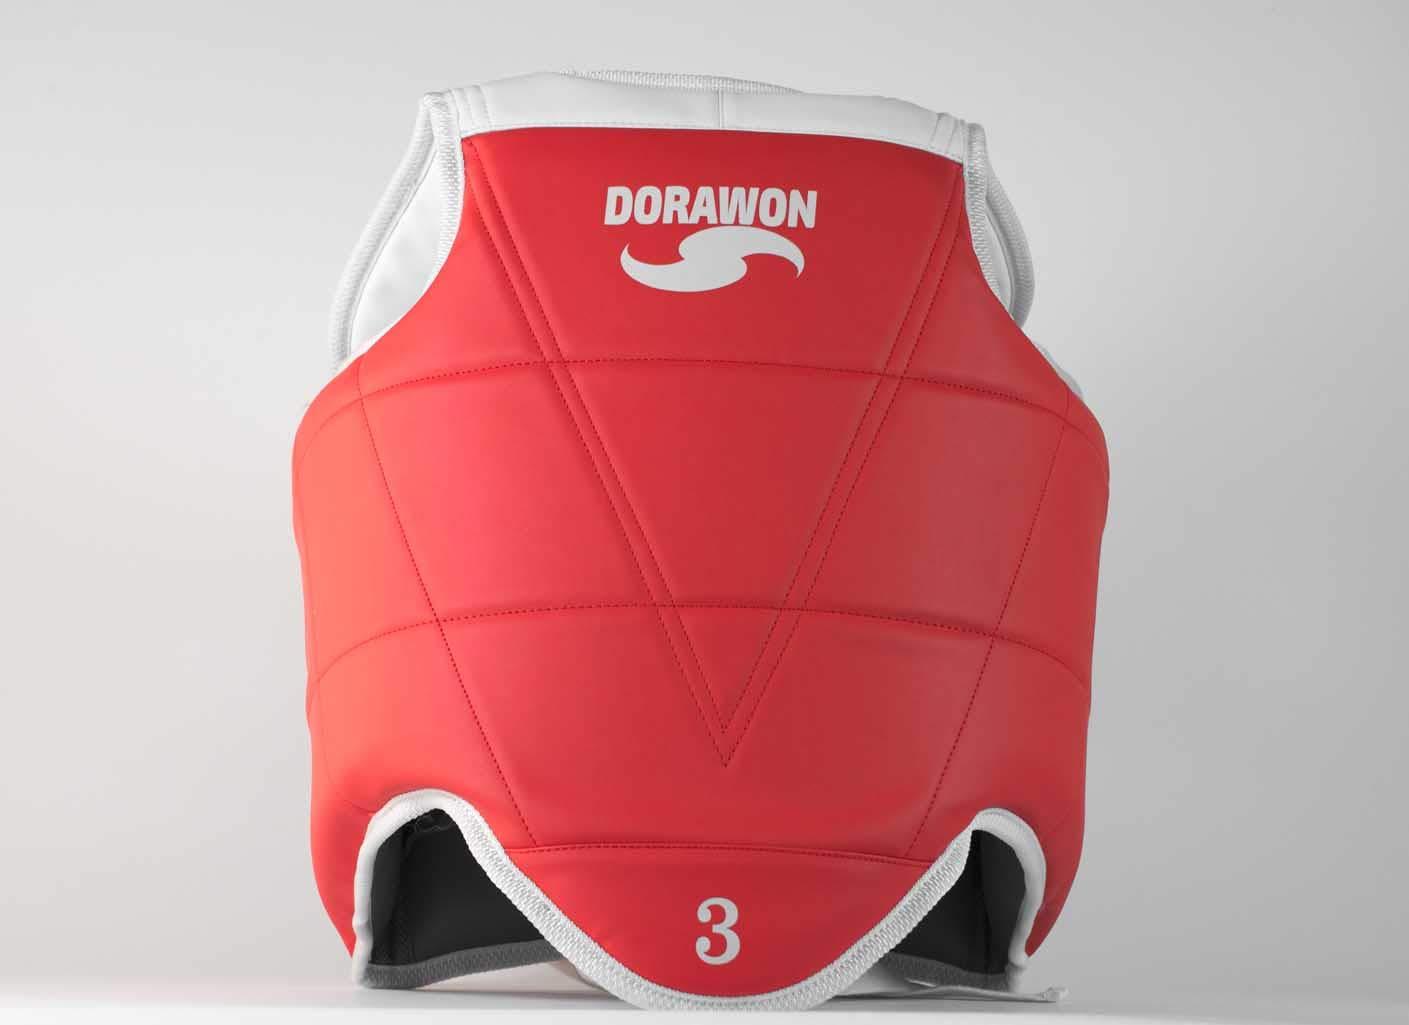 Dorawon Busan Peto de Taekwondo Unisex Infantil, Unisex niñ os, Color Rojo/Azul, tamañ o 0 Unisex niños tamaño 0 DORZT|#Dorawon Z06Z0Busan672Bicolore